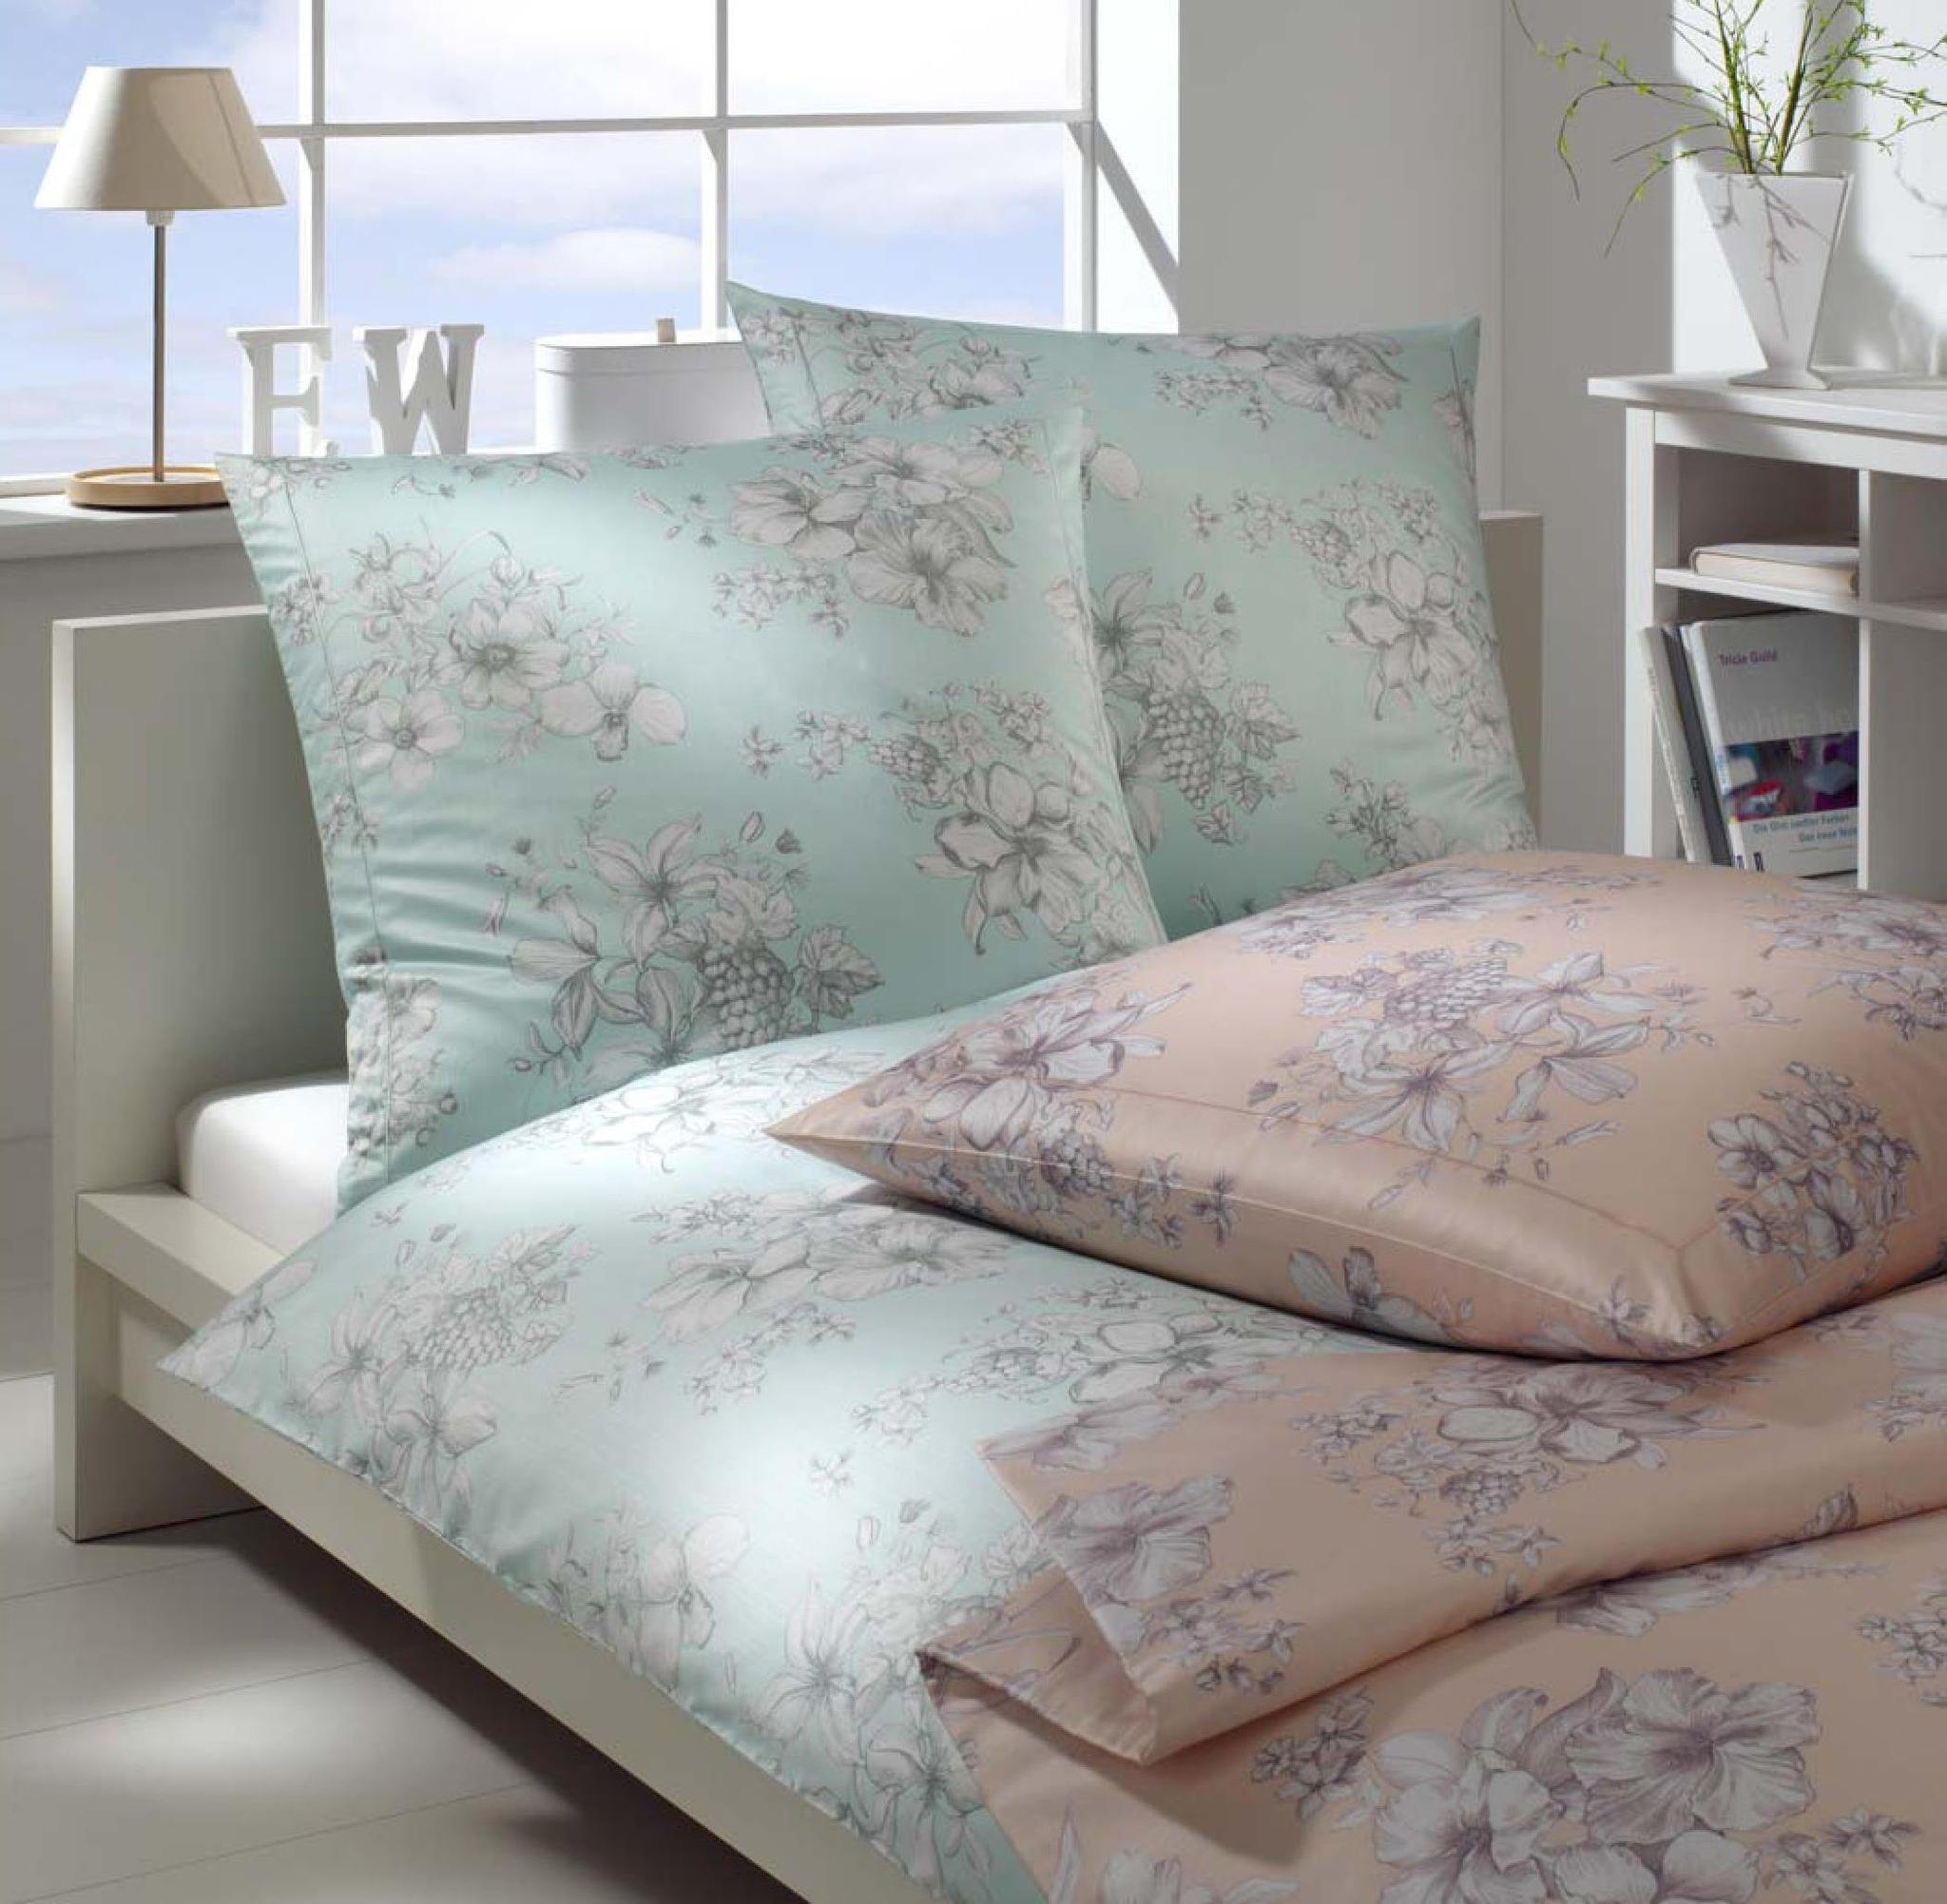 Для сна Наволочка 50x70 Elegante Fleurie персиковая elitnaya-navolochka-fleurie-persikovaya-ot-elegante-germaniya.jpg